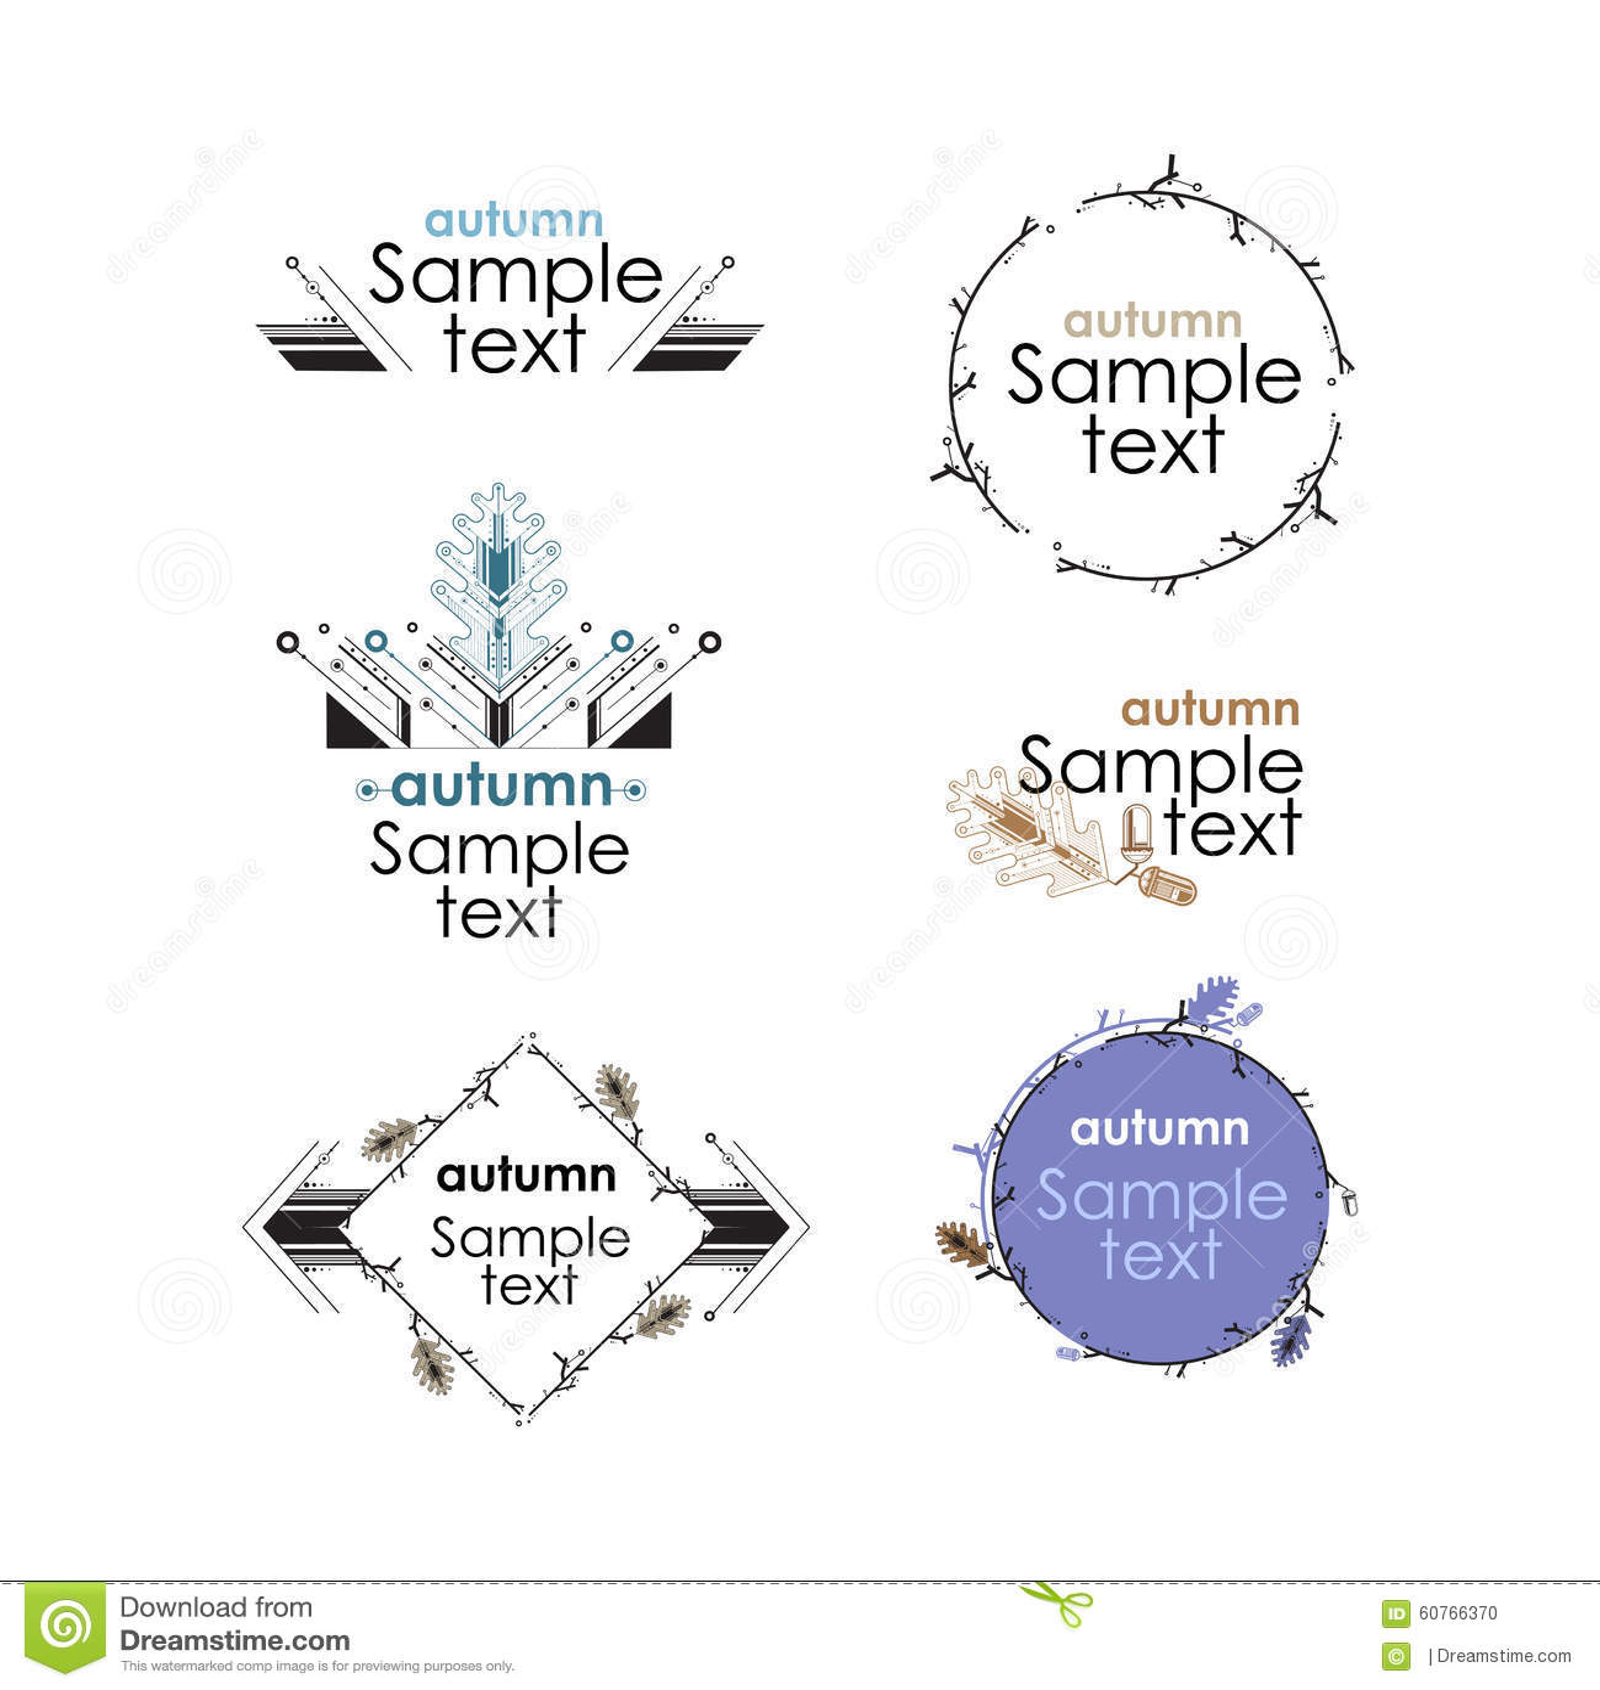 Outline of academic disciplines